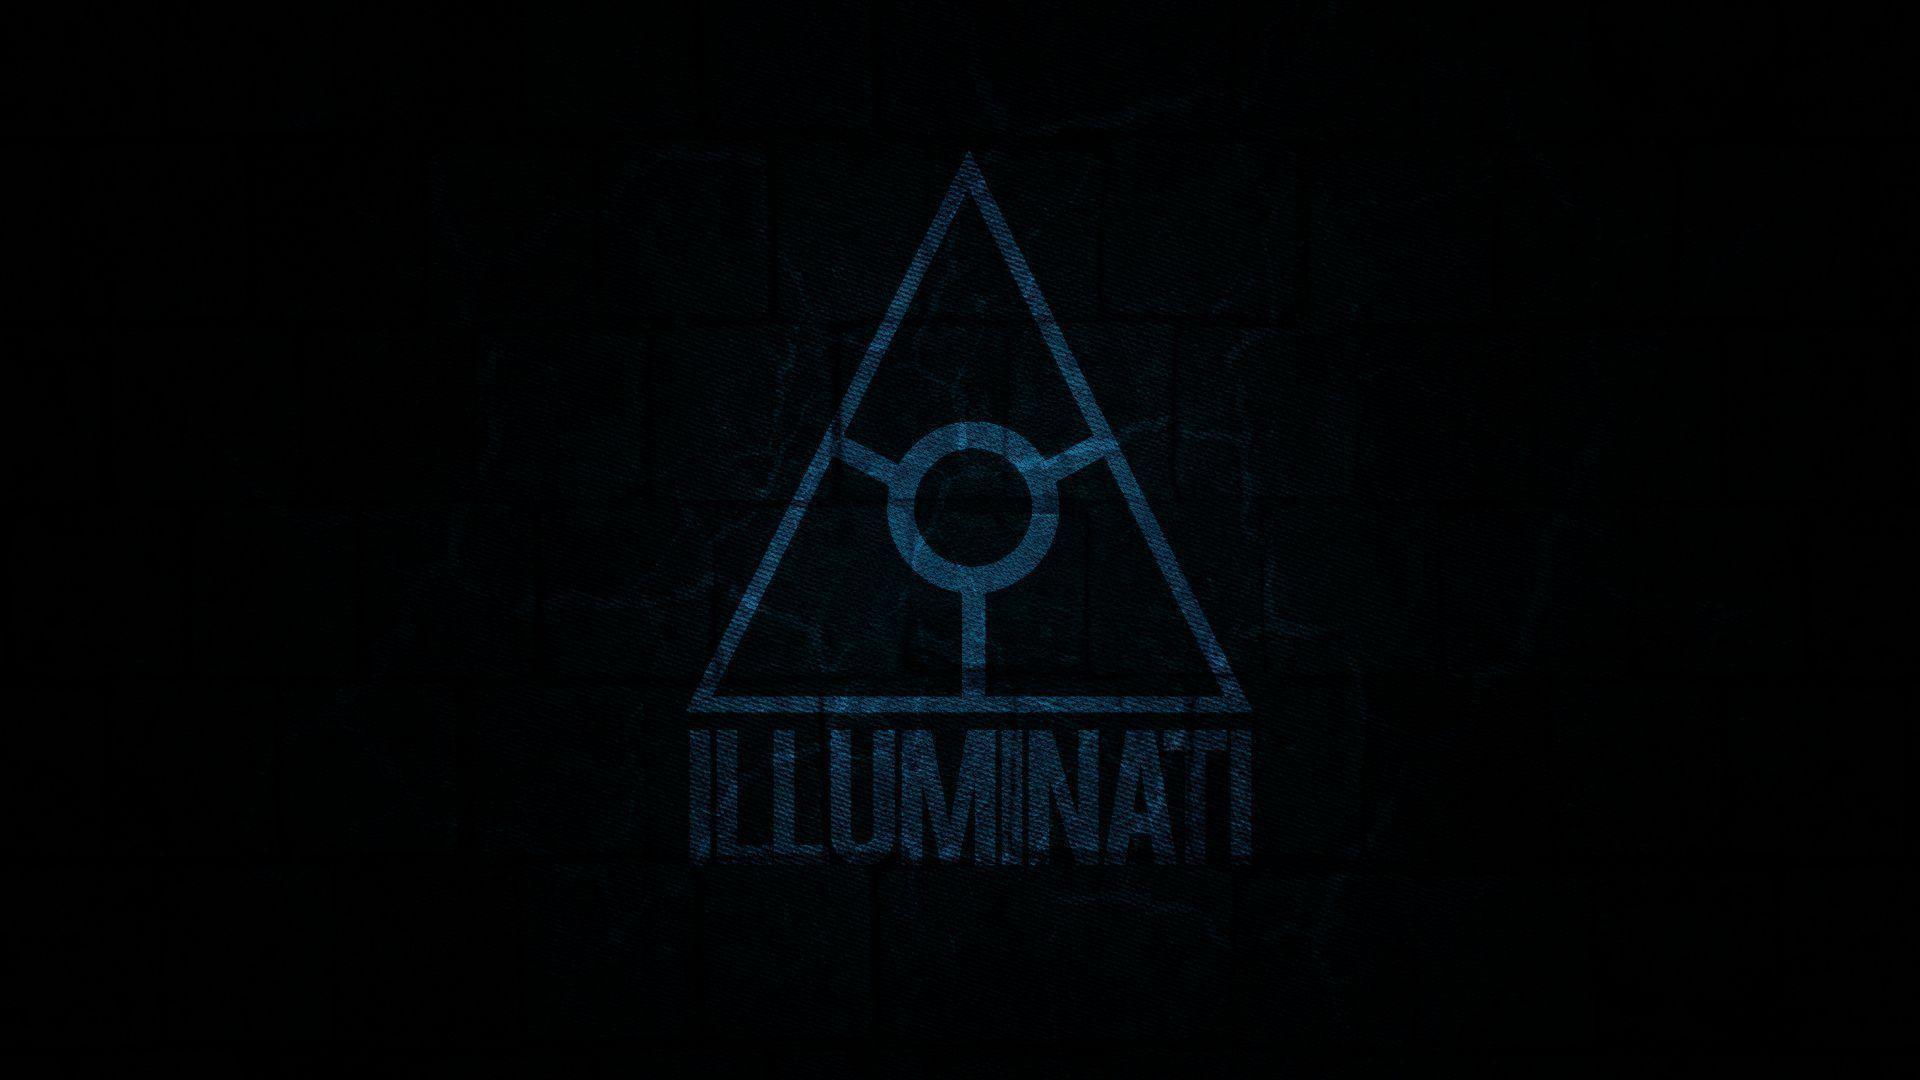 illuminati symbol wallpaper 1920x1080 - photo #3